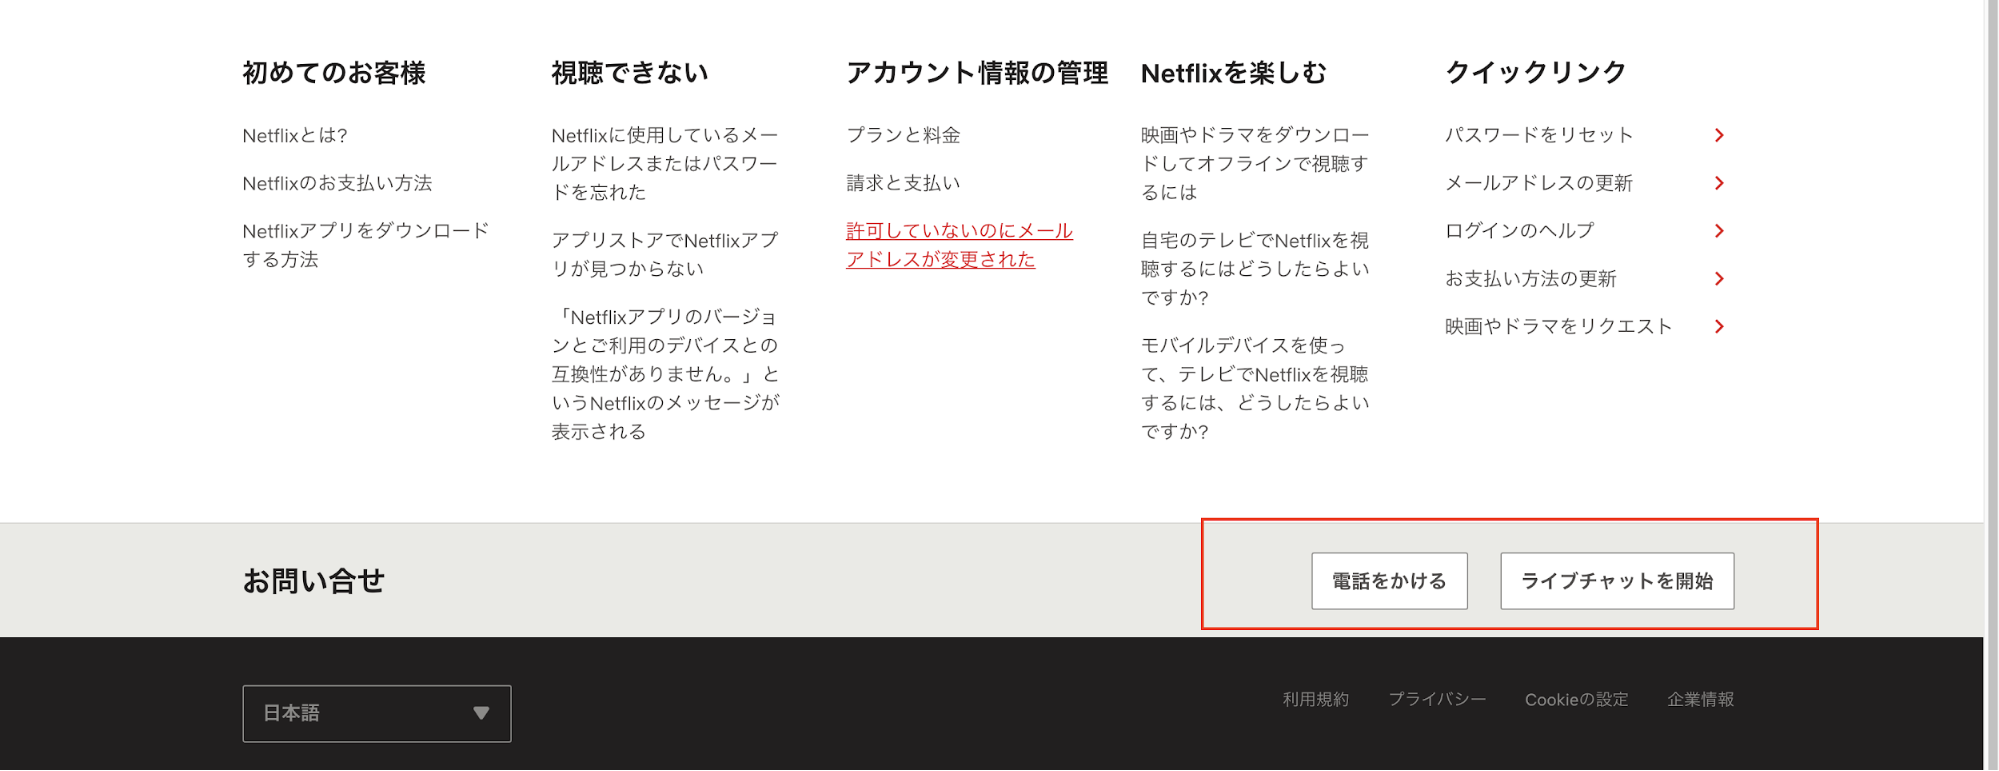 netflixの問い合わせ方法